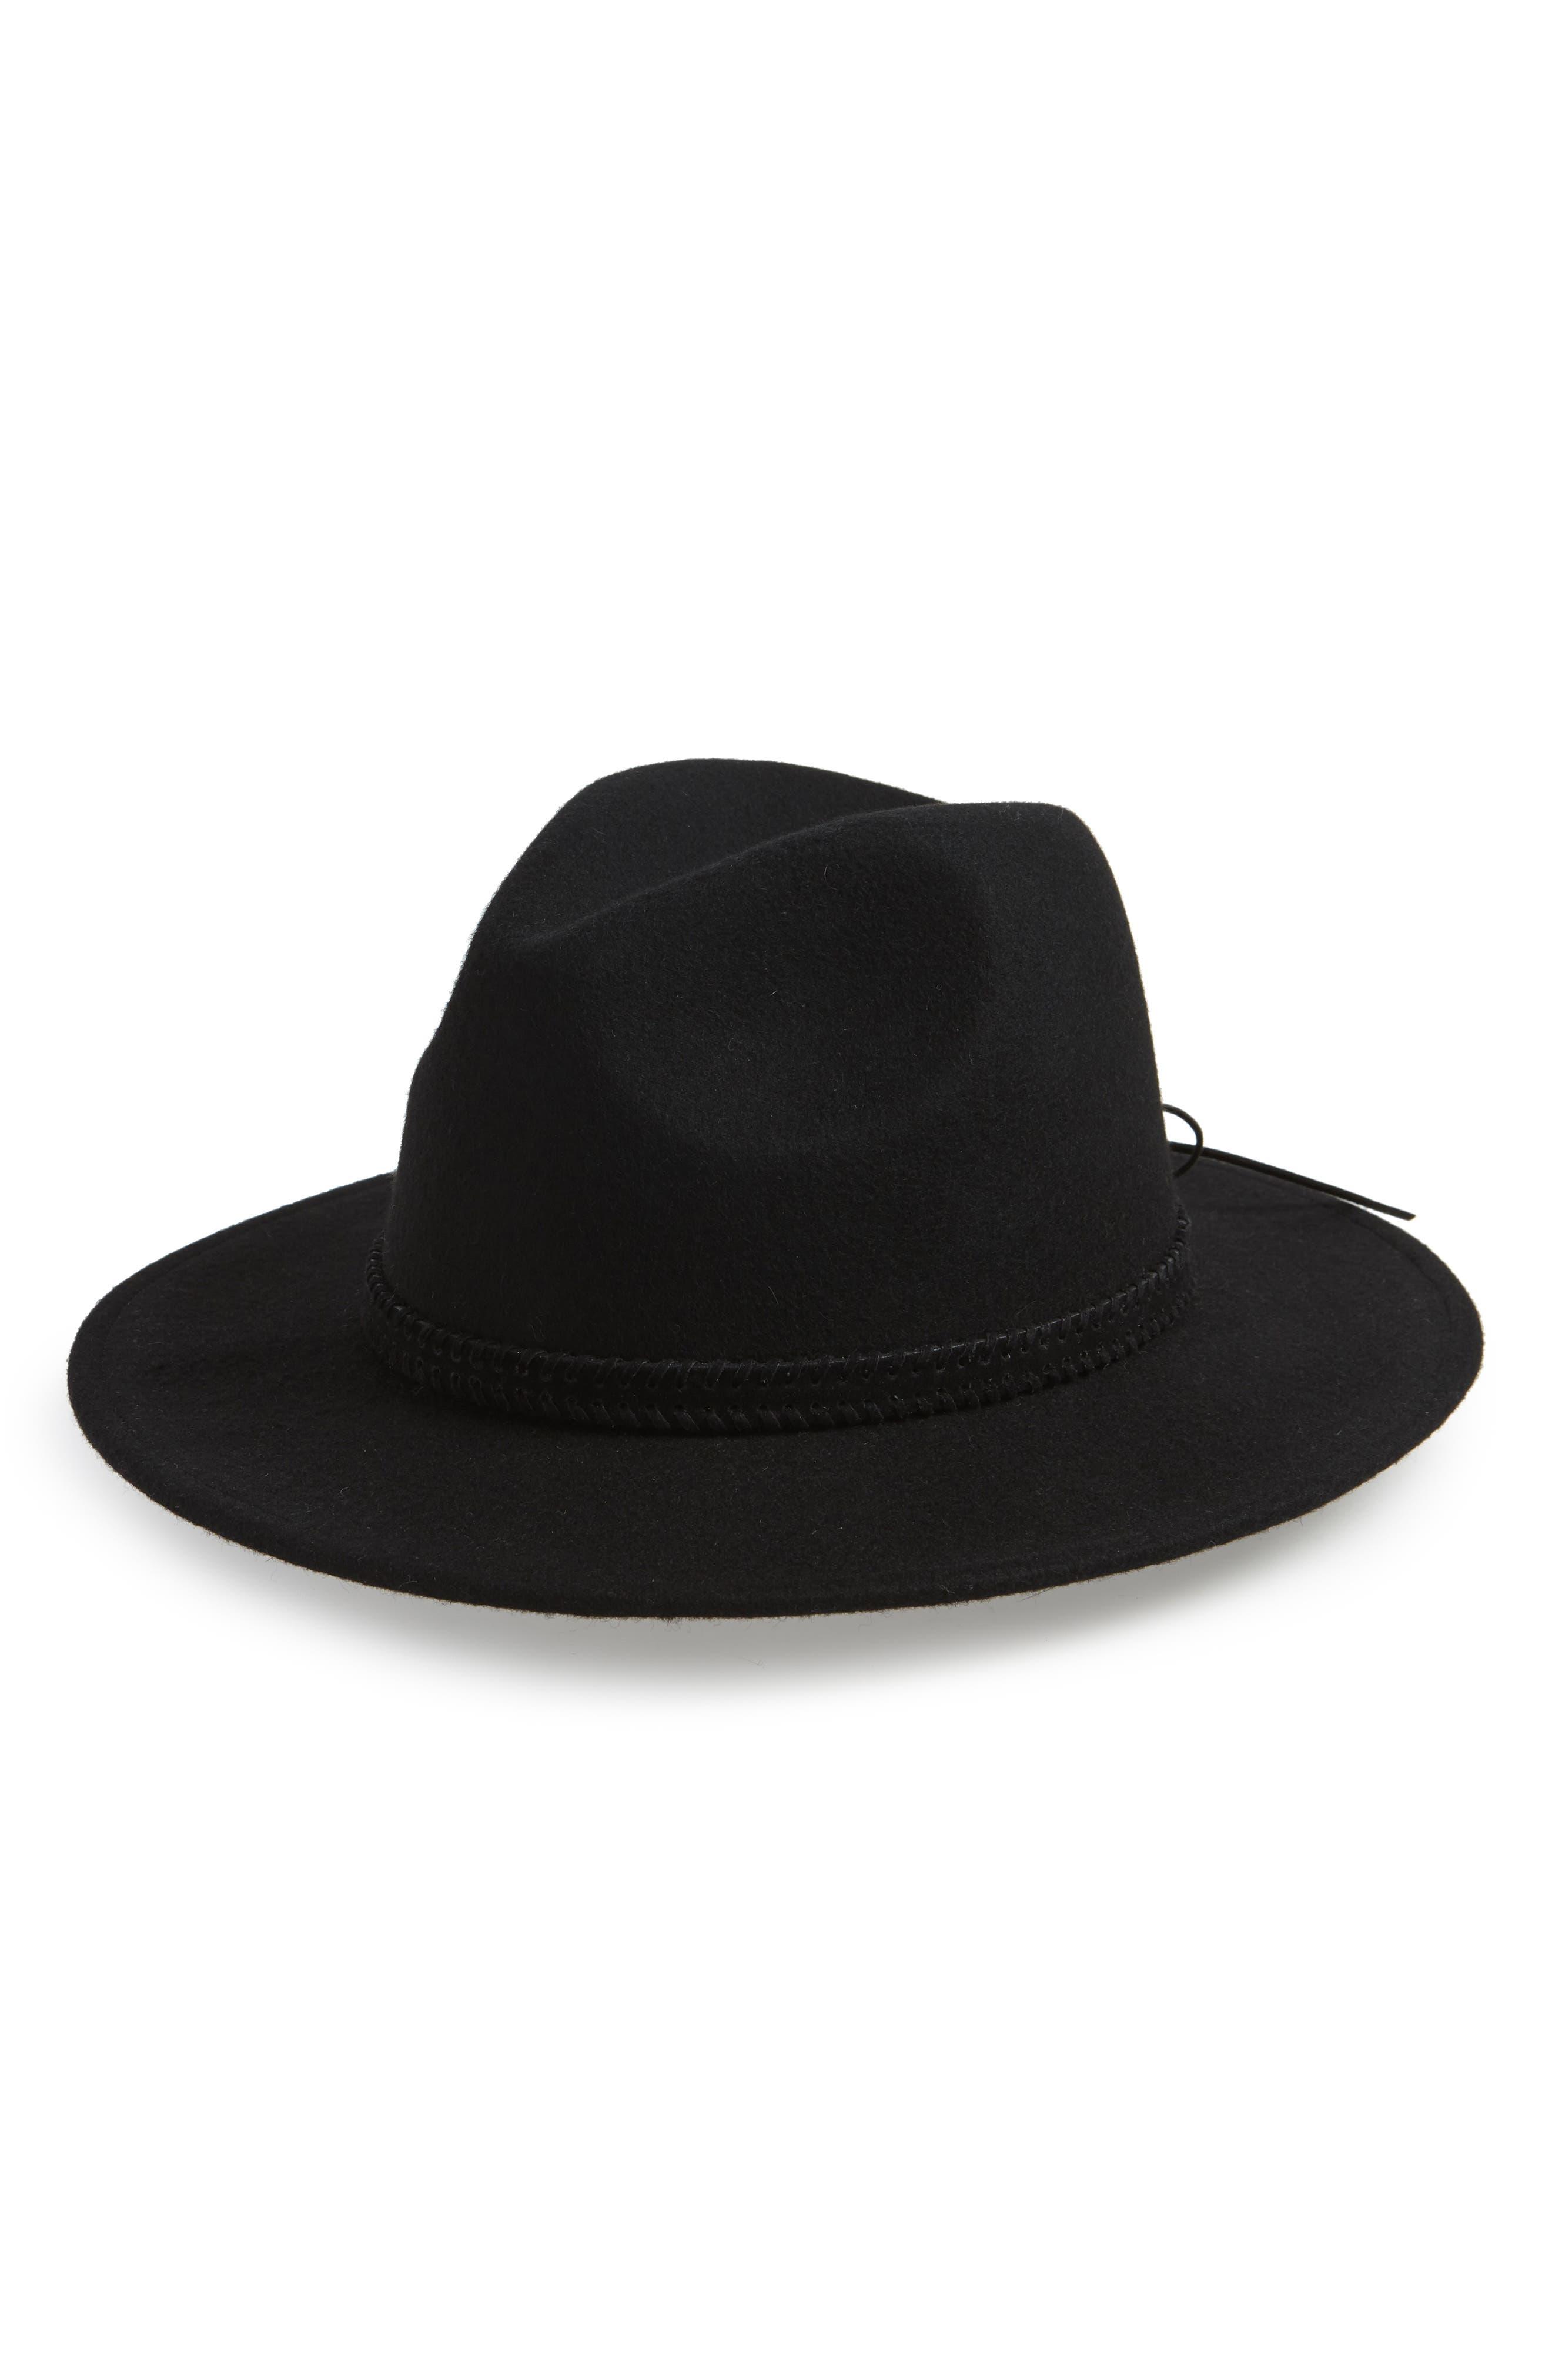 Felt Panama Hat,                         Main,                         color, BLACK